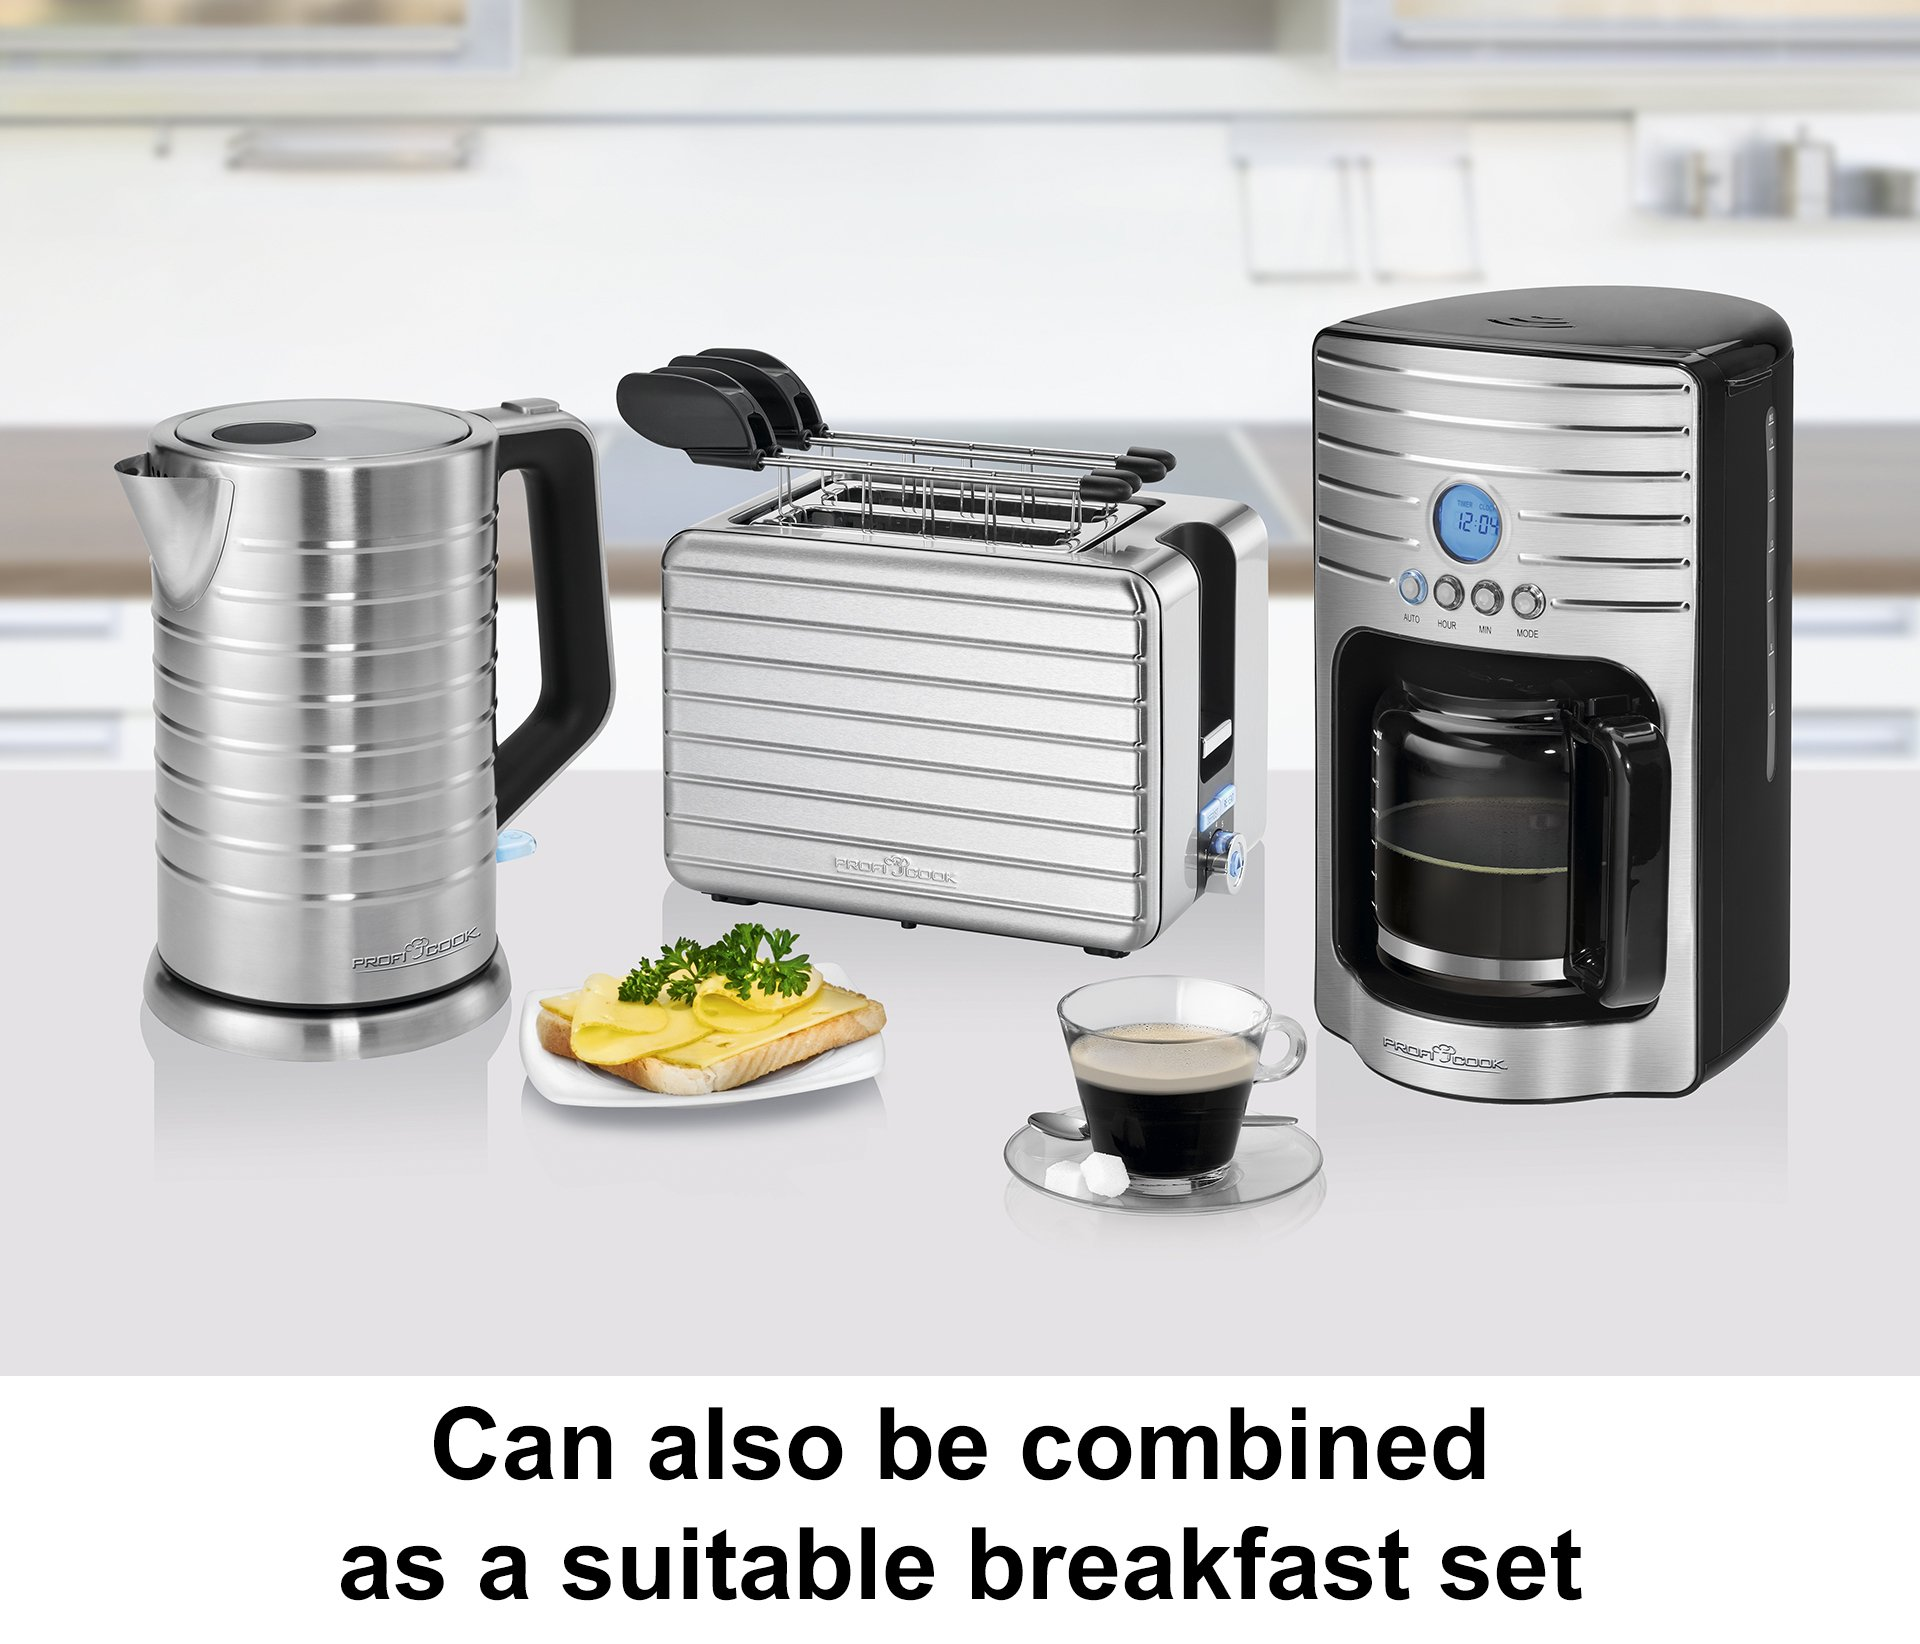 rofiCook-PC-KA-1120-Kaffeeautomat-fr-15-Tassen-ca-17-Liter-Edelstahlfront-Programmierbare-24-Stunden-LCD-Digital-Zeitschaltuhr